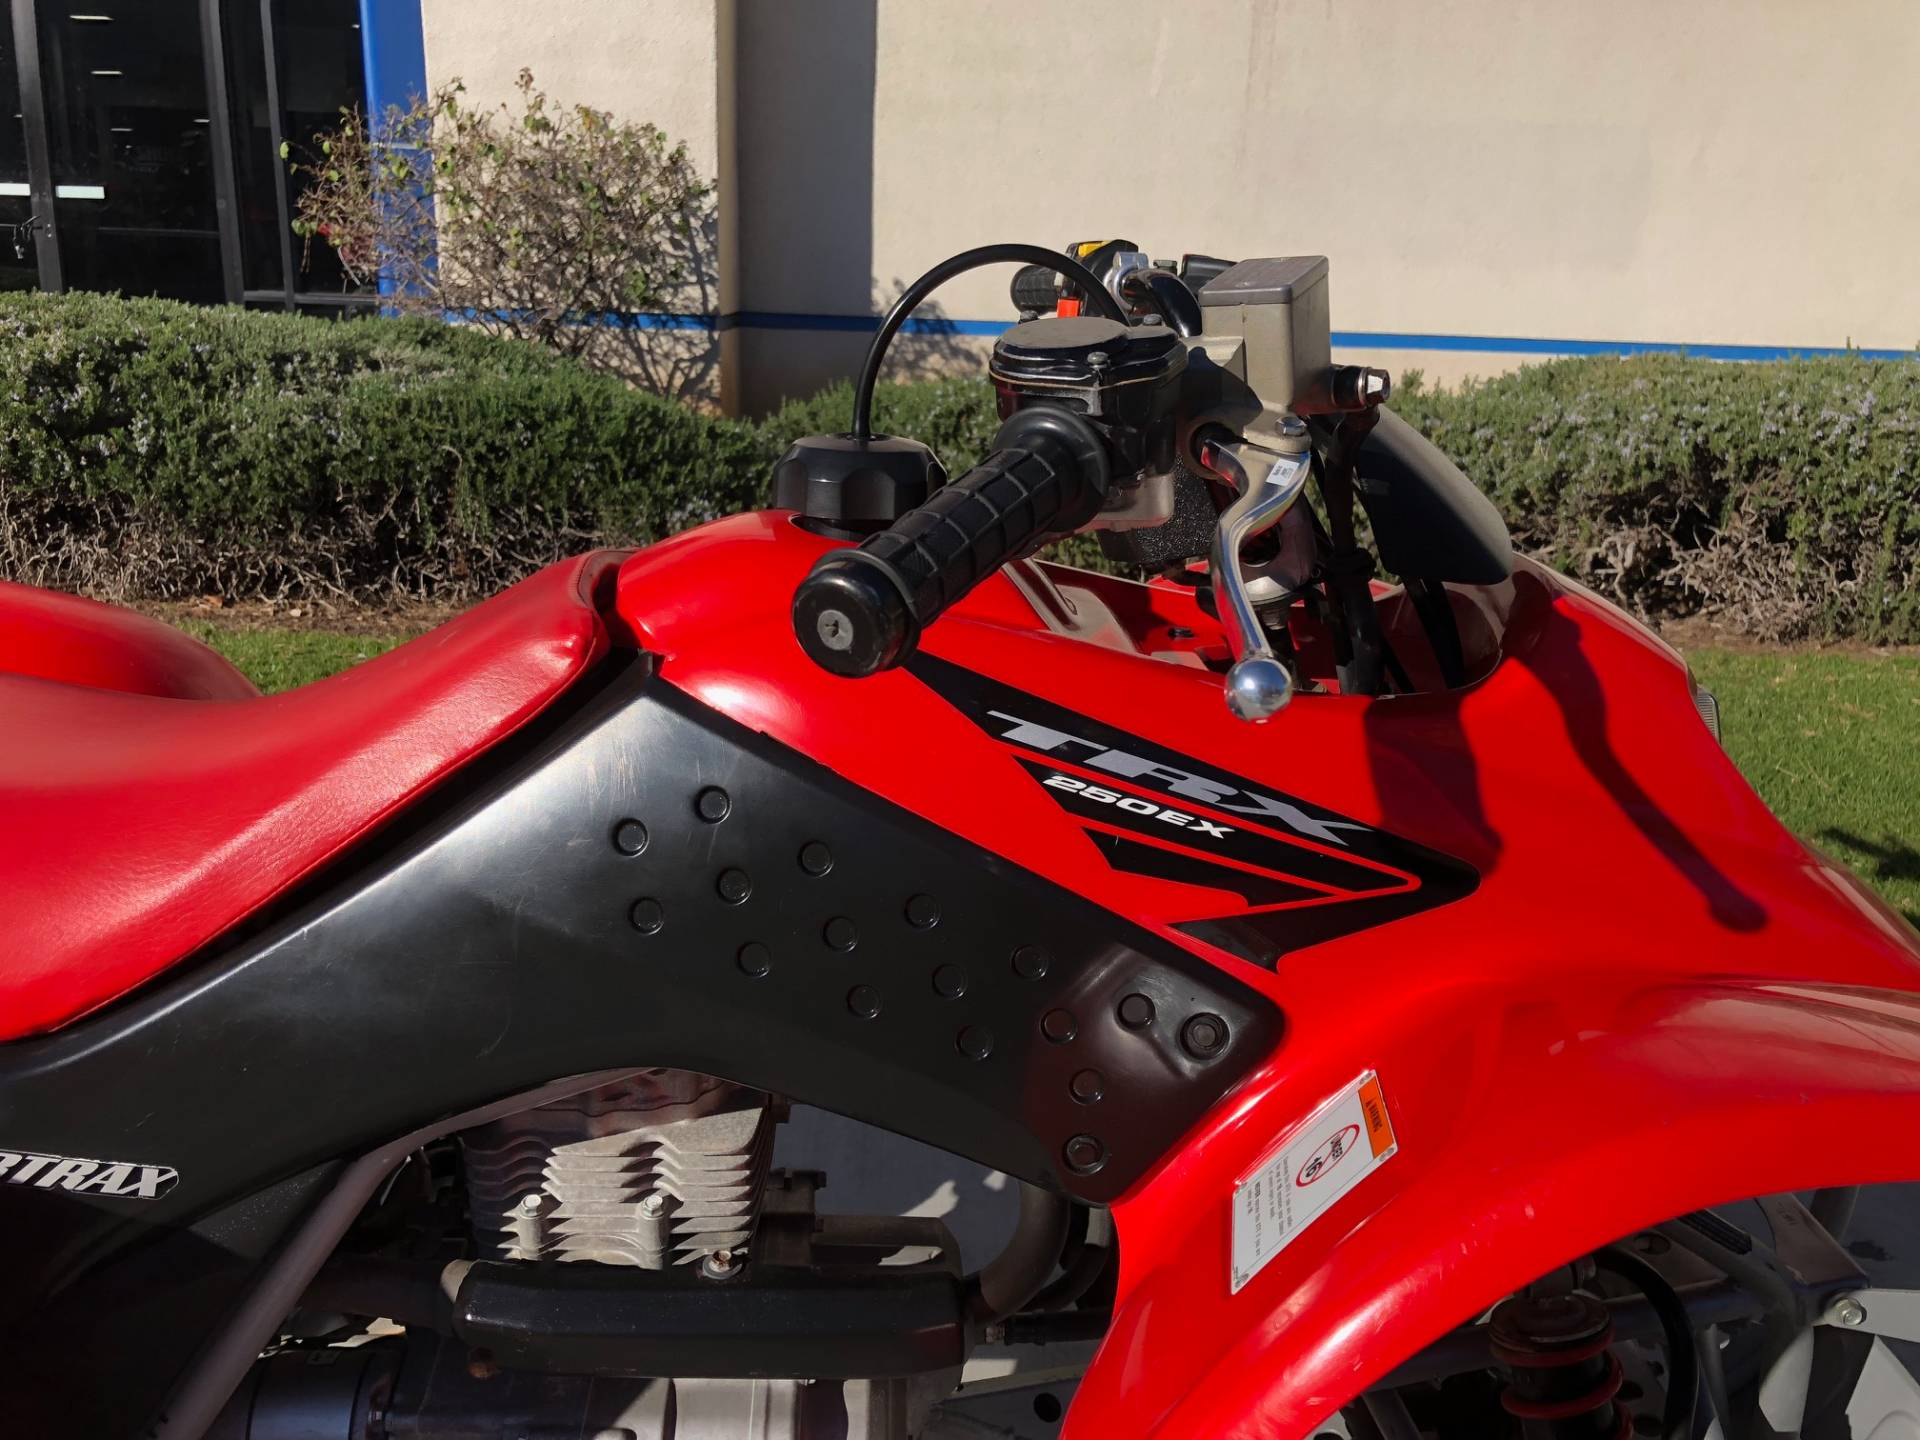 2005 Honda FourTrax Recon 11